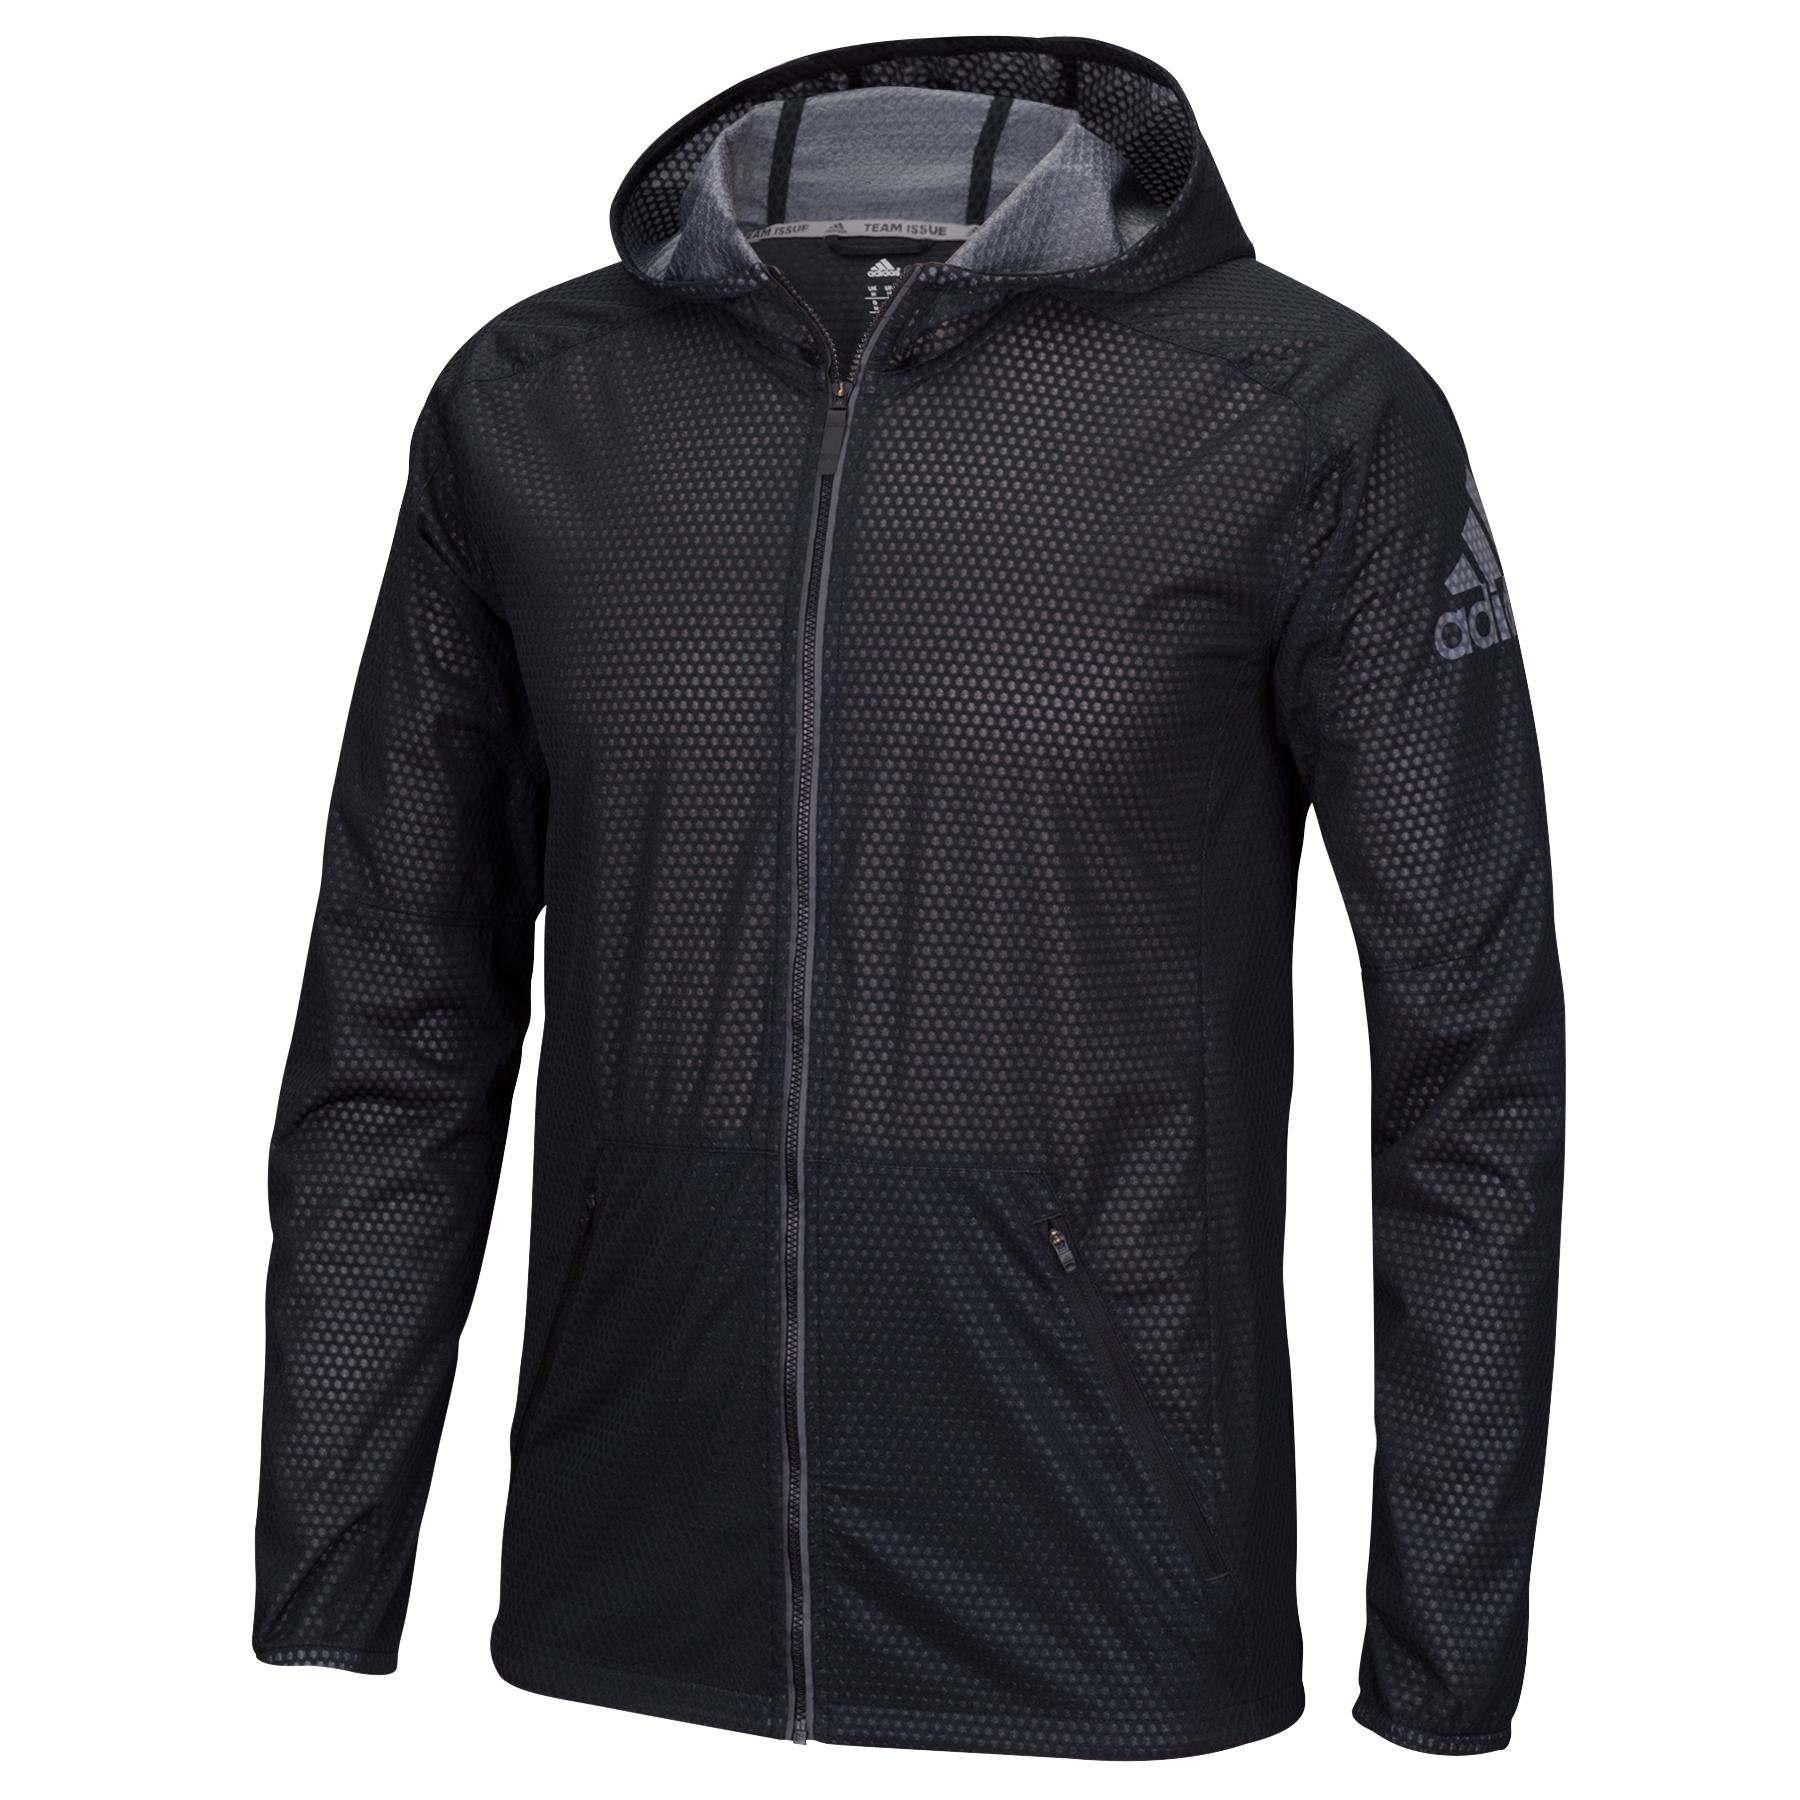 low priced 163d6 63f84 adidas Men s Climastorm Full Zip Jacket - Slickdeals.net